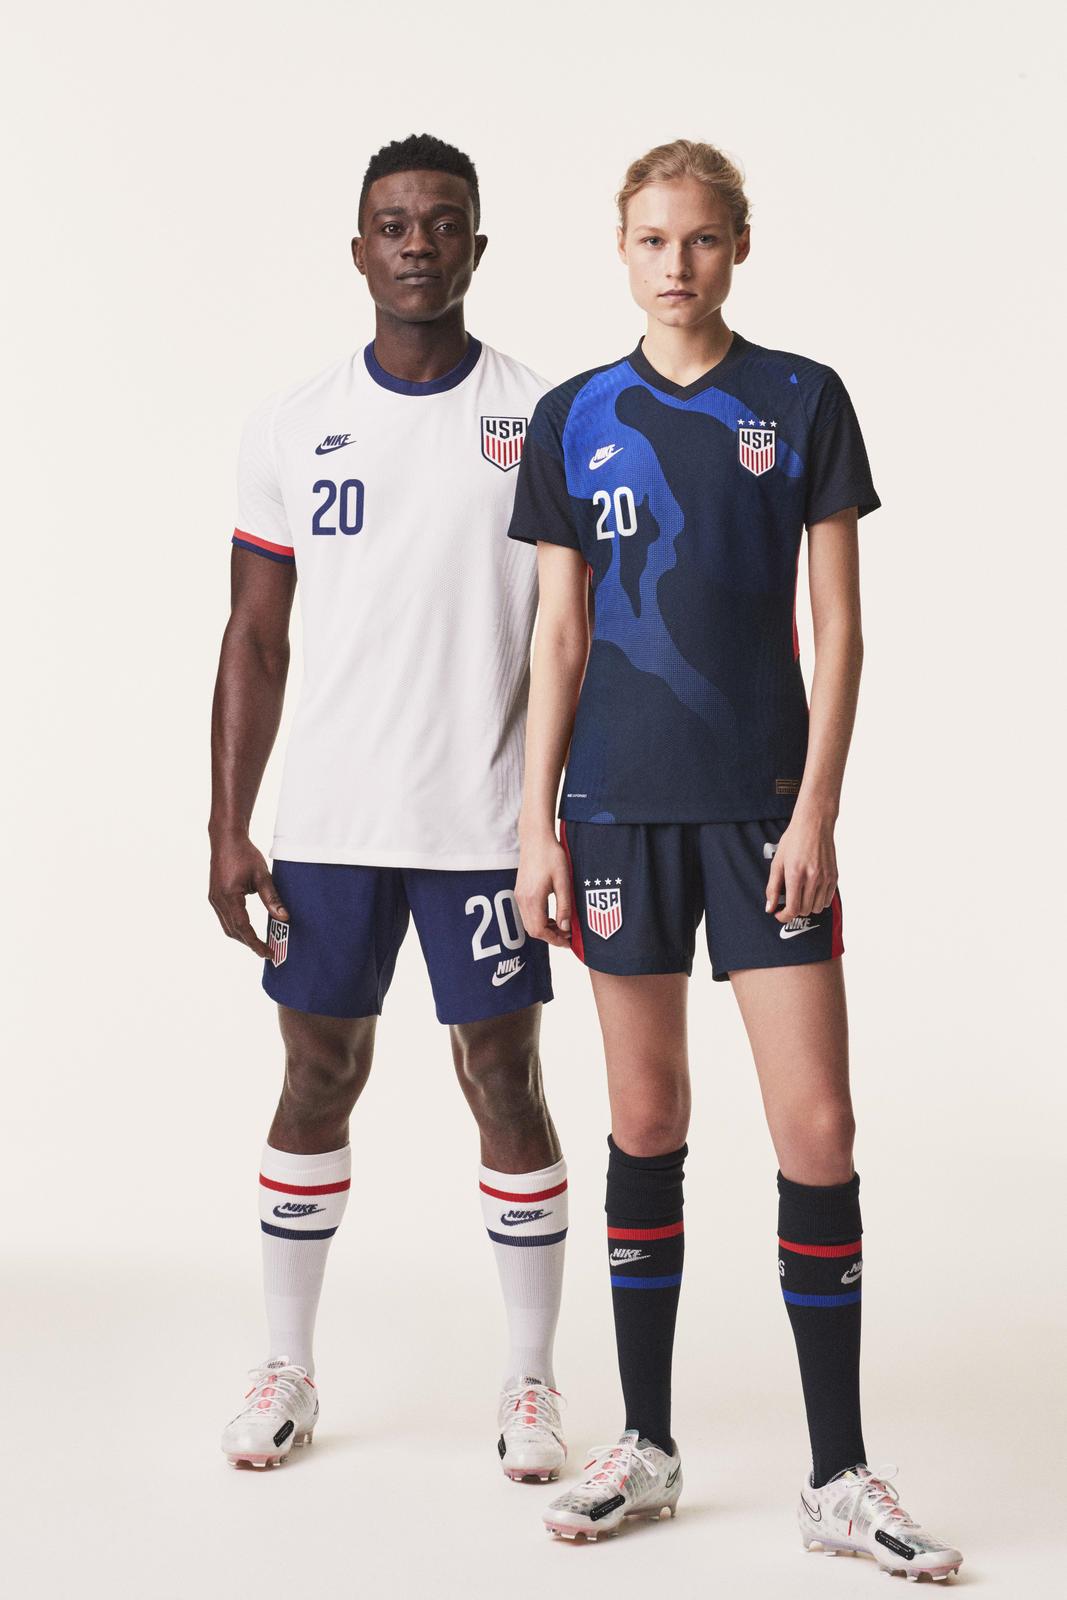 Nike Football 2020 Kits: Art + Science!